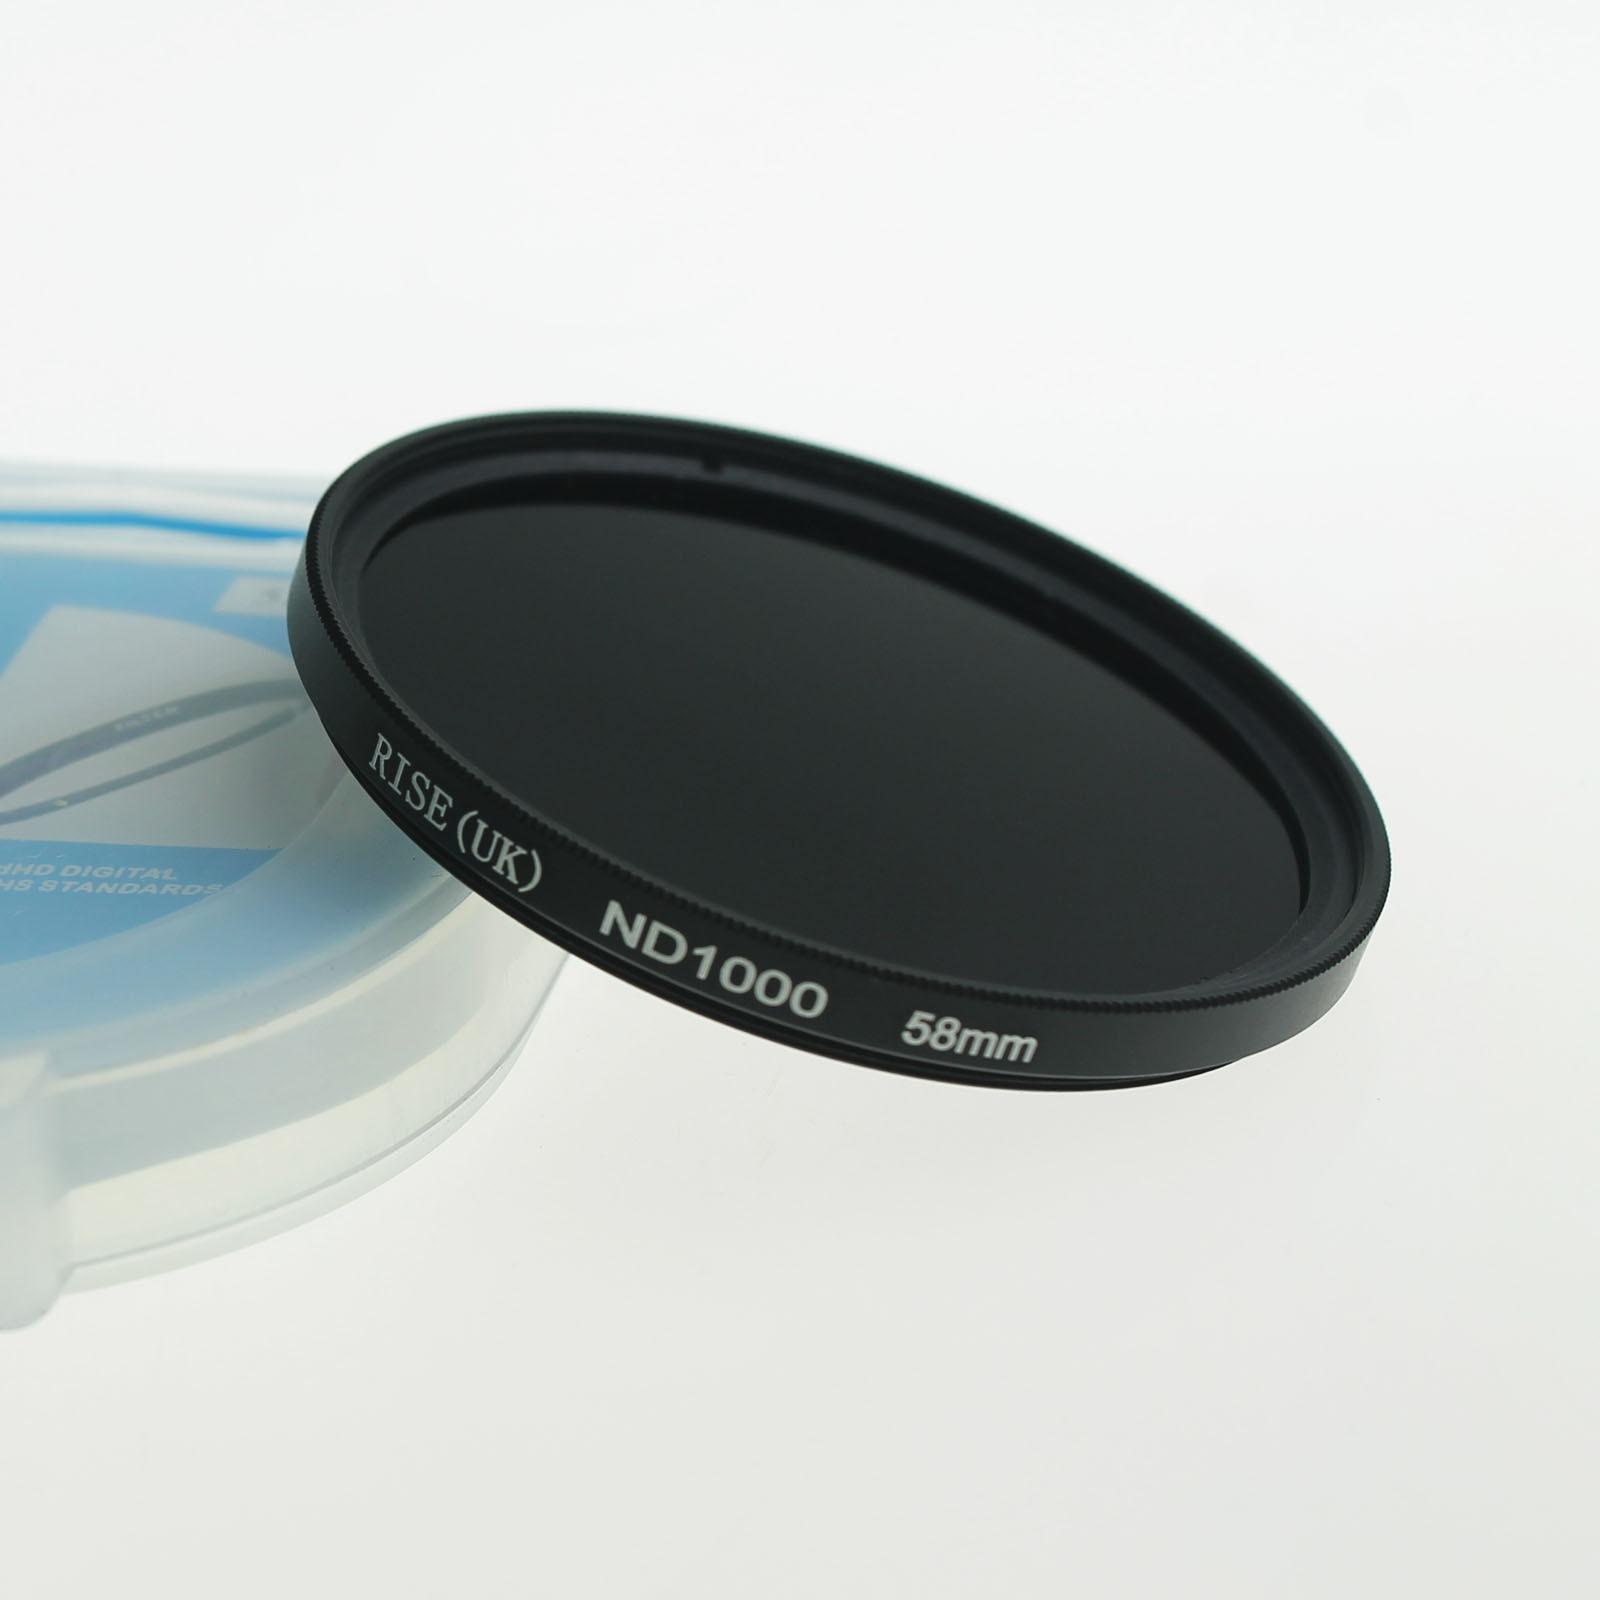 RISE 58mm slim Neutral density optical grade ND ND1000 filter for digital camera lens DV